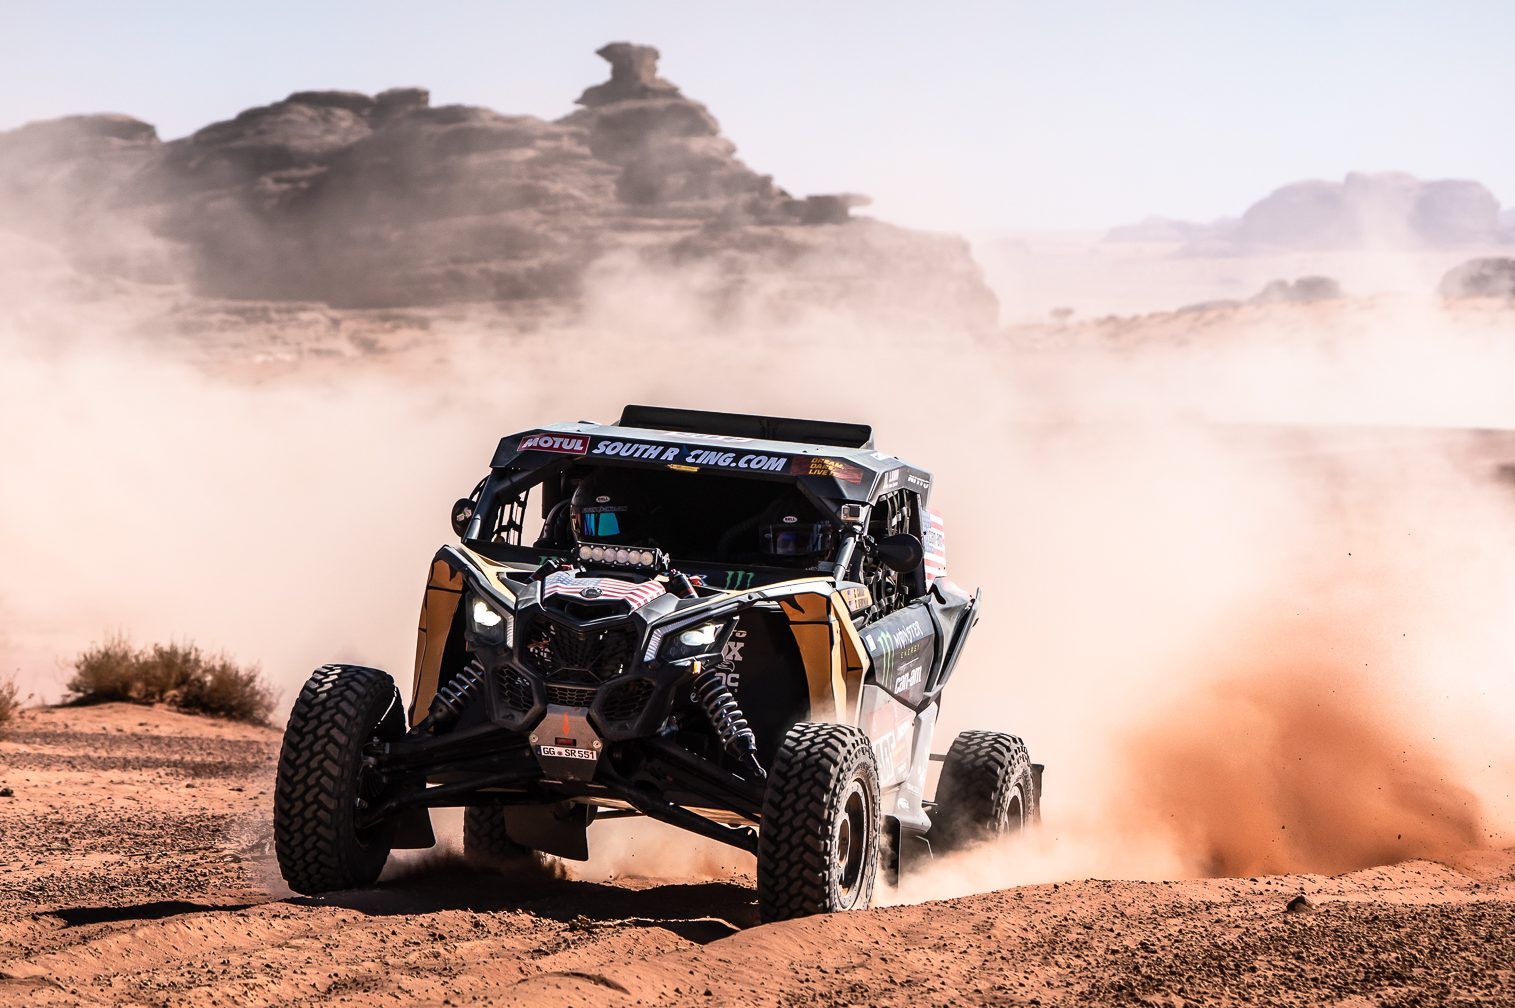 Casey Currie racing at the Dakar Rally, an event he won. (Can-Am)